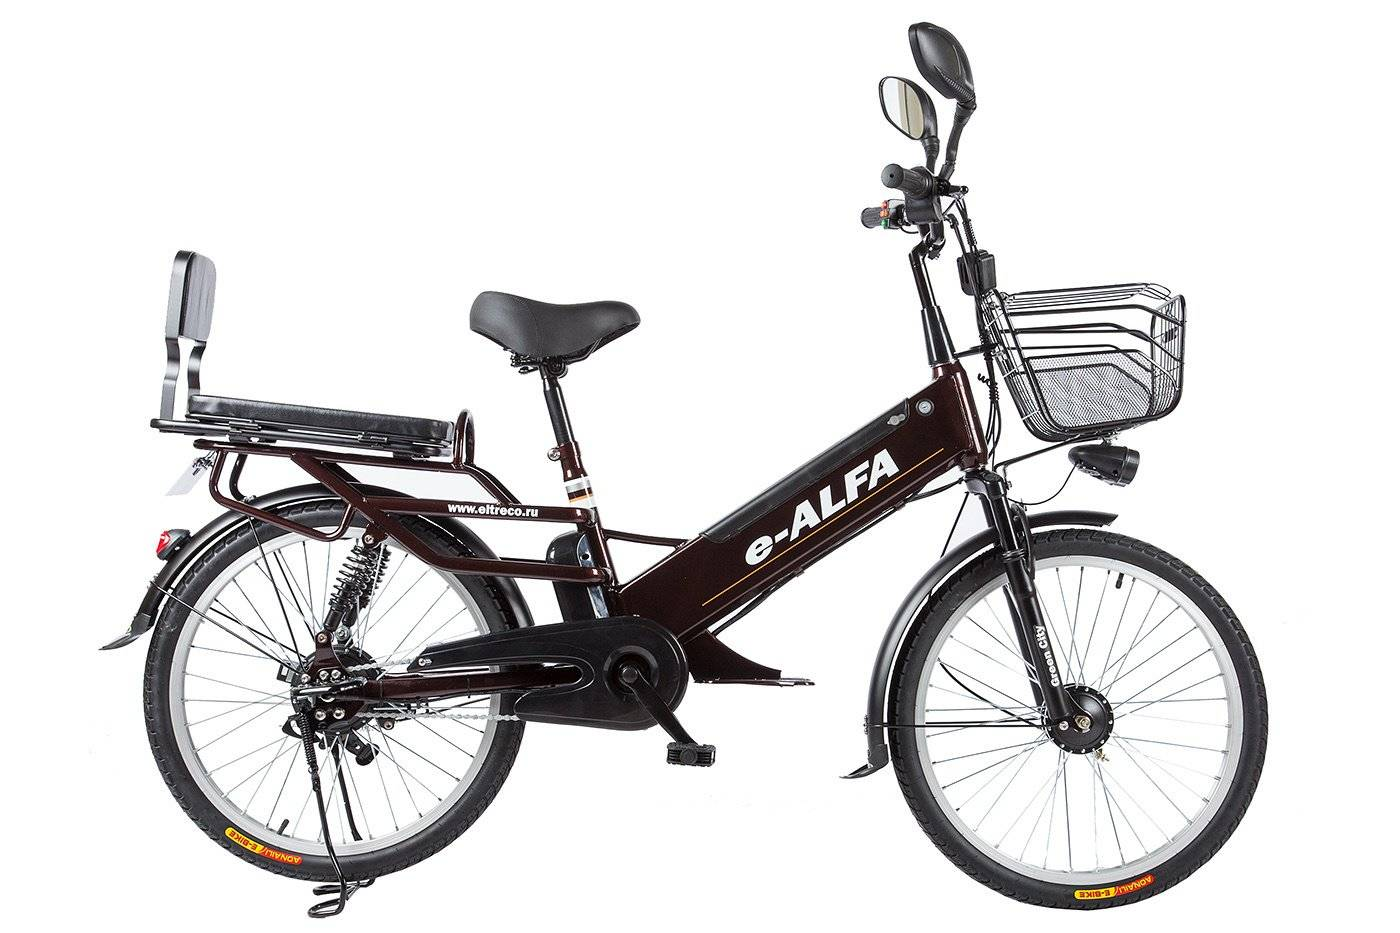 Велогибрид Eltreco e-ALFA L 350W, 010823-0083, фото 4